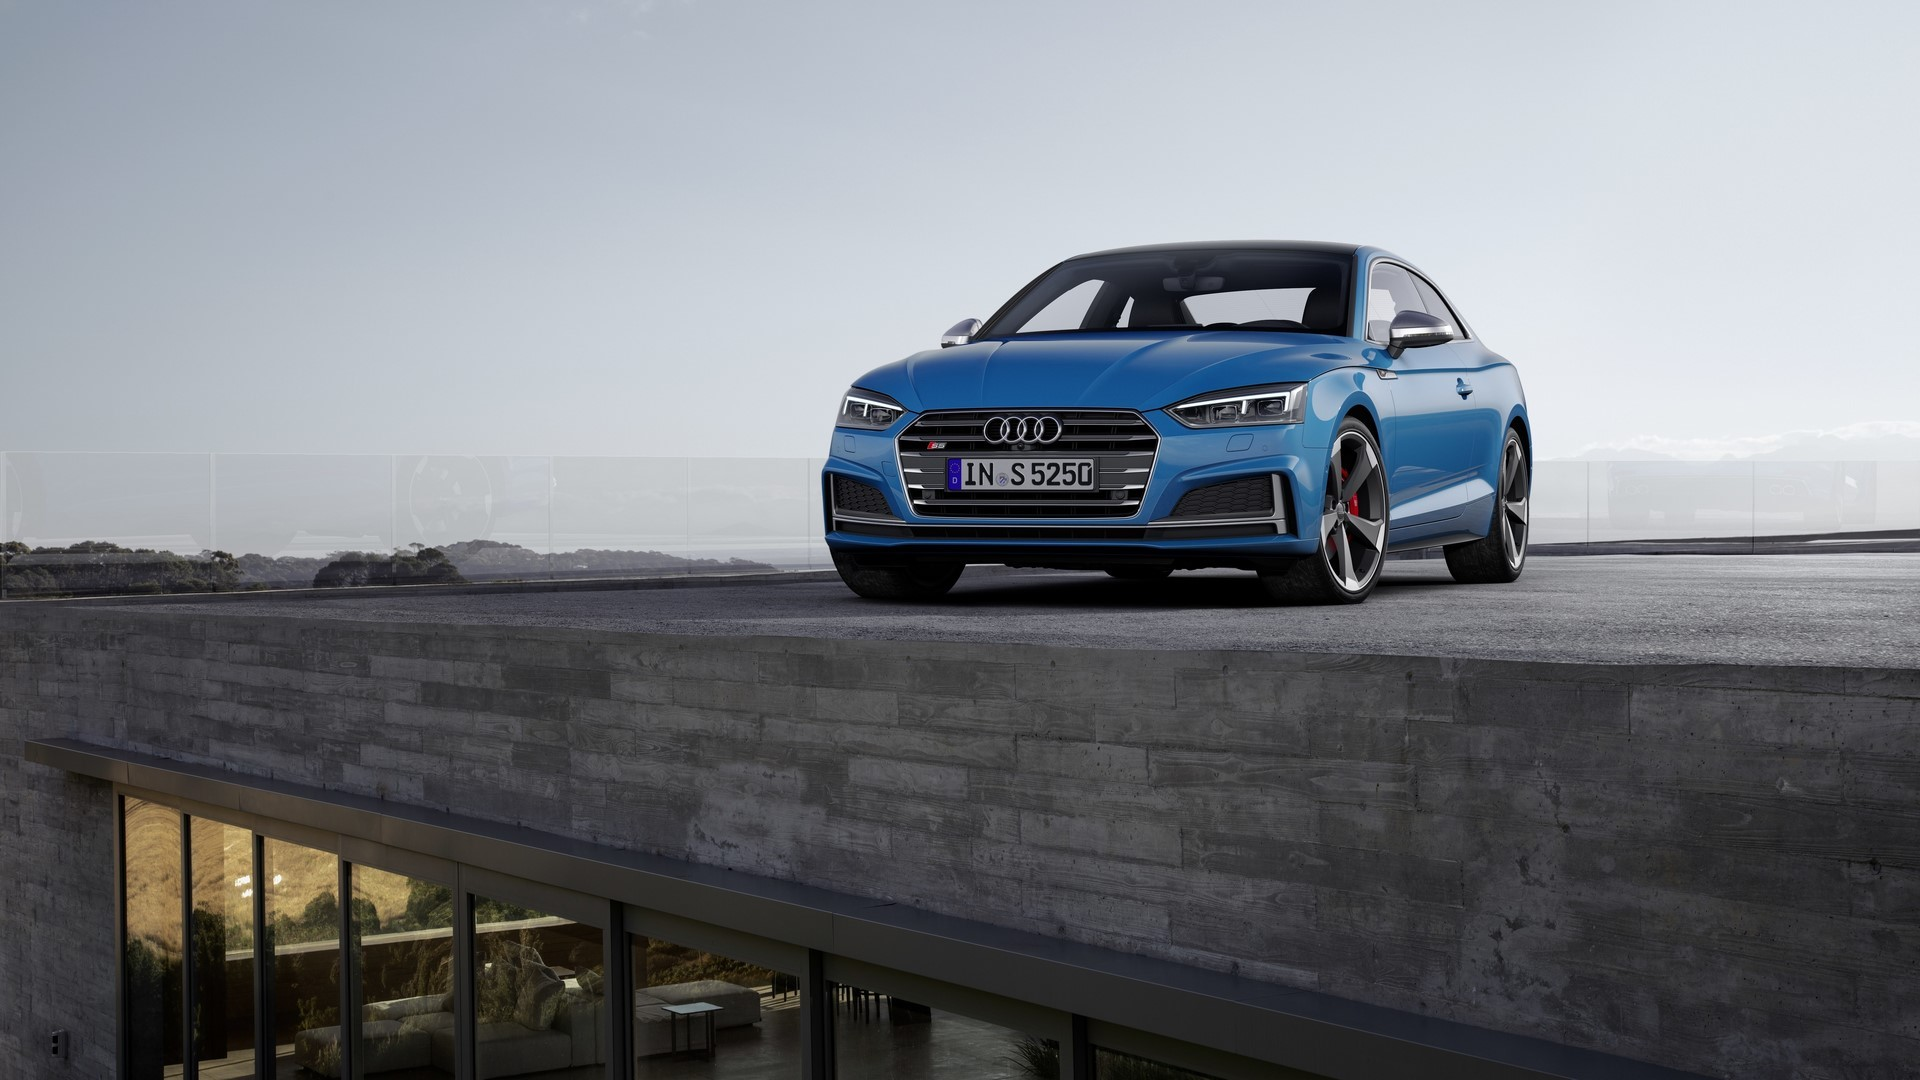 Audi-S5-TDI-Coupe-3